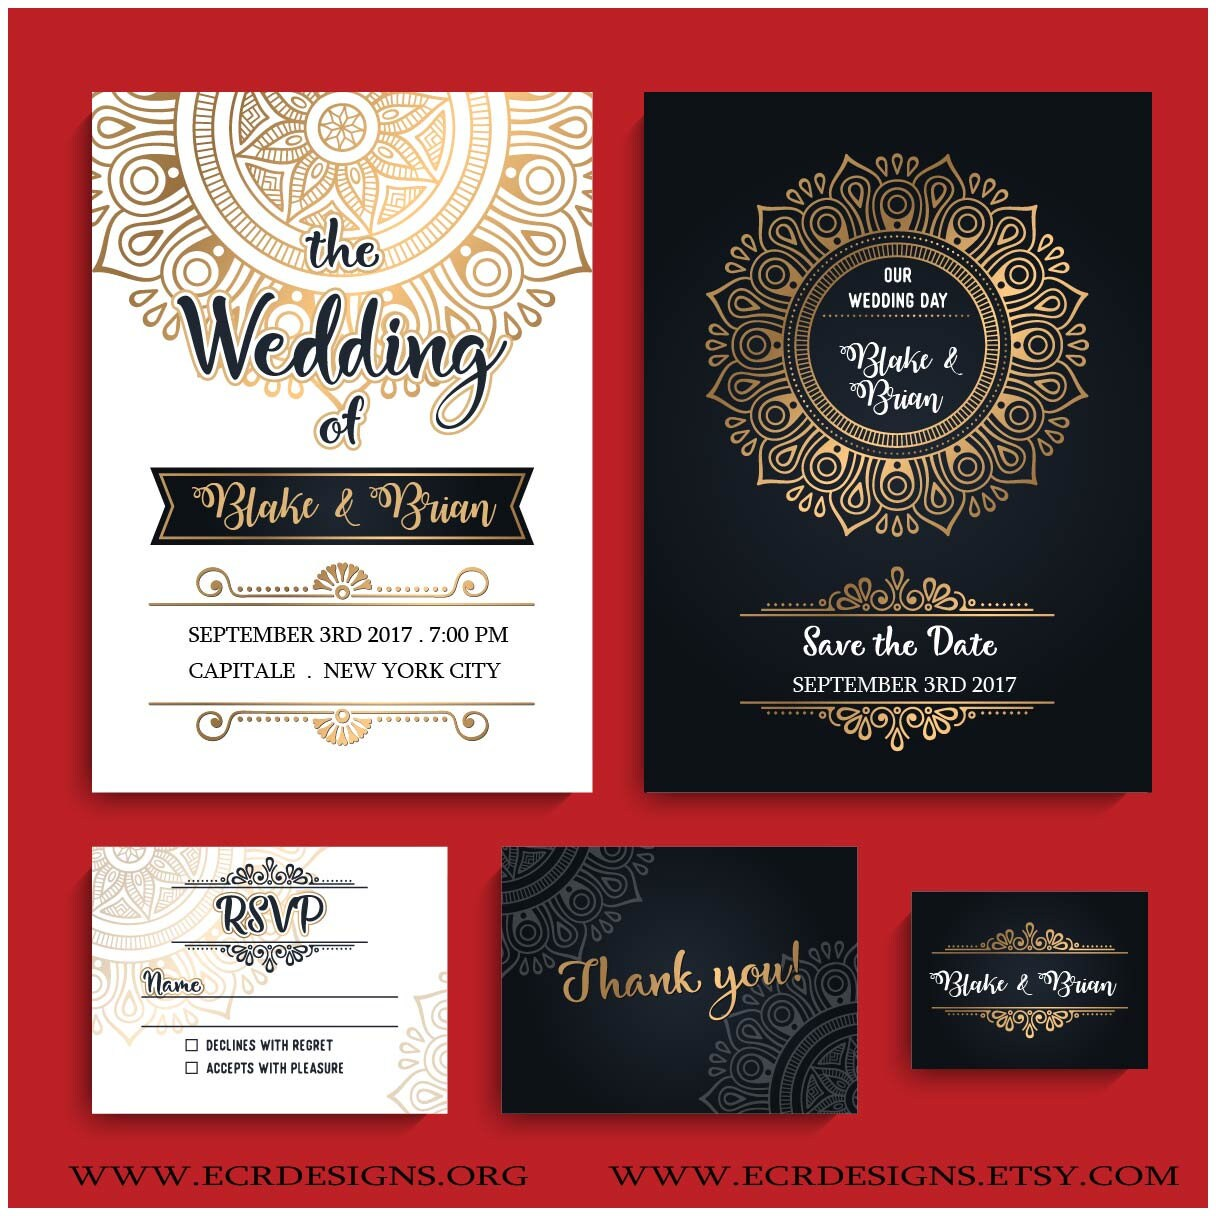 Black White and Gold Wedding invitation. Baroque Anniversary